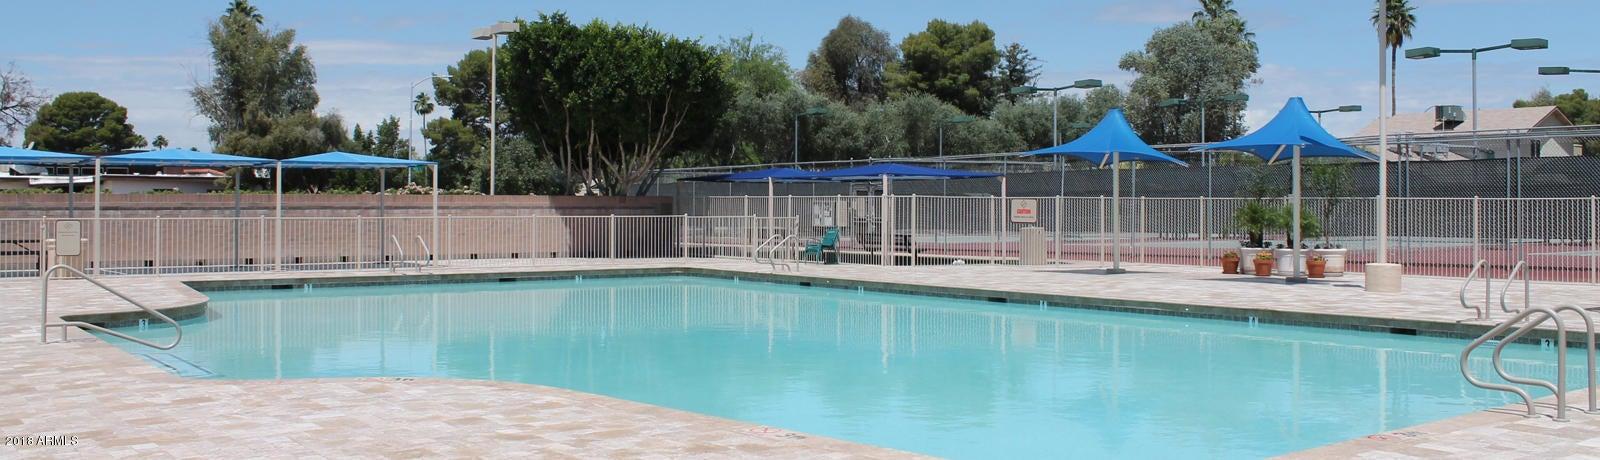 MLS 5784673 2603 W JAVELINA Avenue, Mesa, AZ 85202 Mesa AZ Dobson Ranch